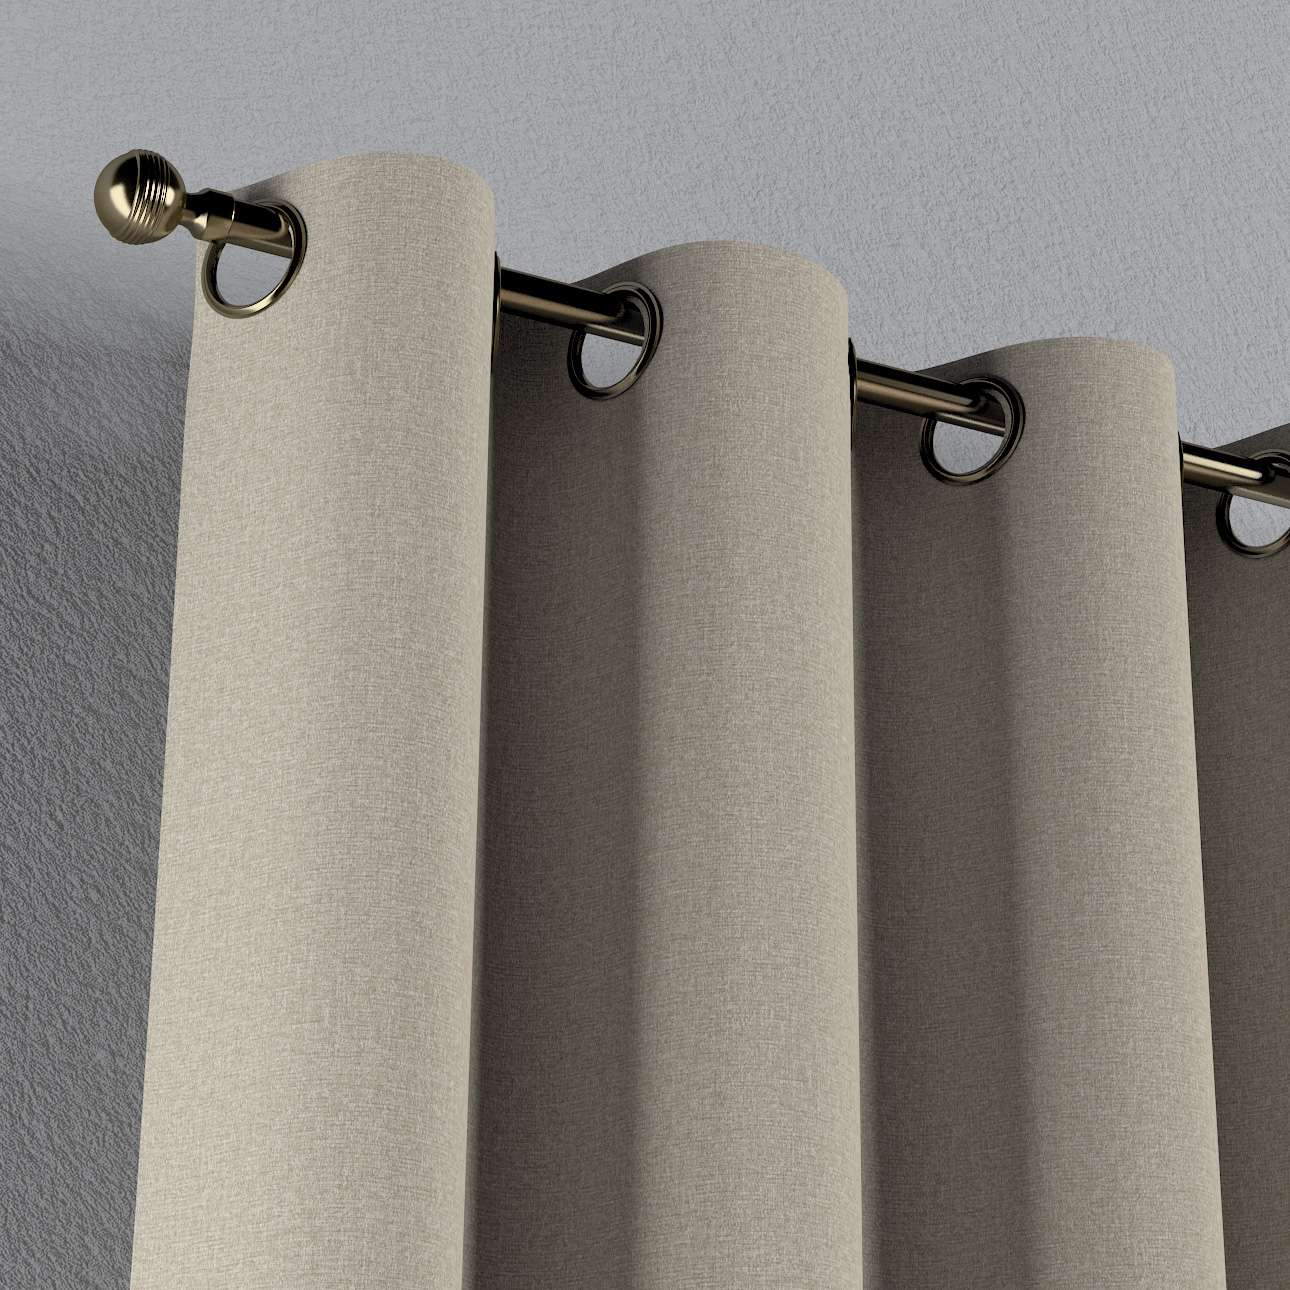 Záves s kolieskami V kolekcii Amsterdam, tkanina: 704-52